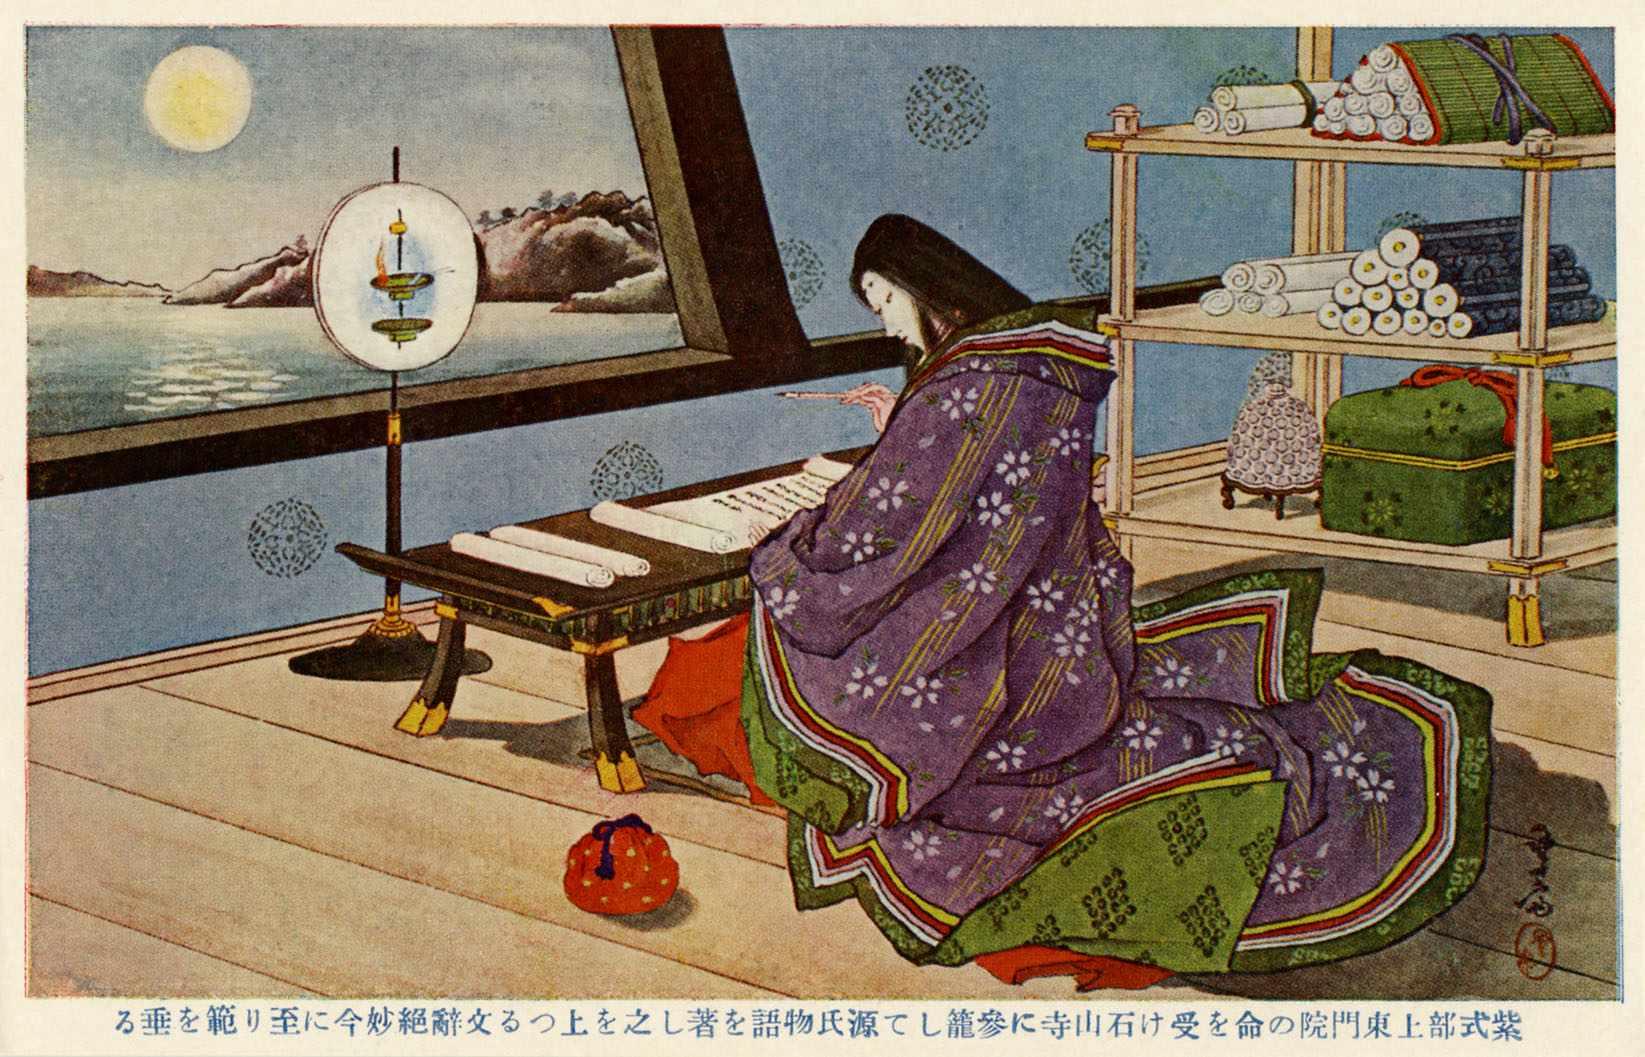 Lady Murasaki writing 'The Tale of Genji'